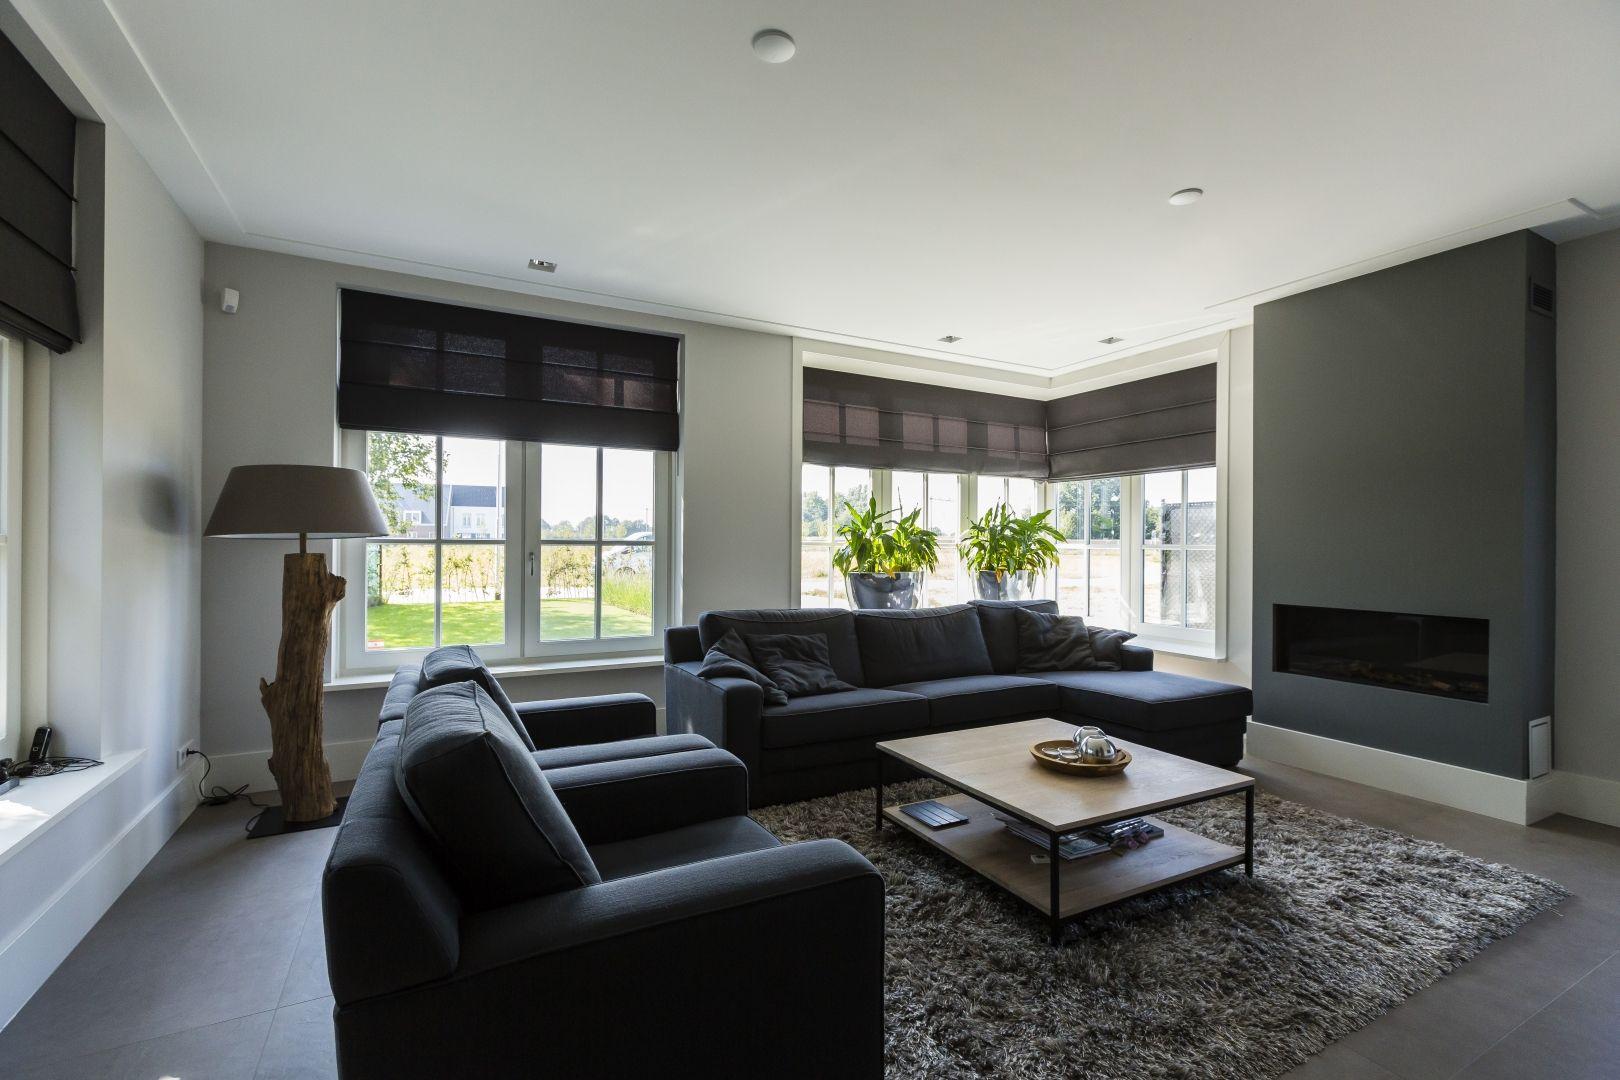 Villa bouwen interieur woonkamer - Woonkamer | Pinterest - Interieur ...